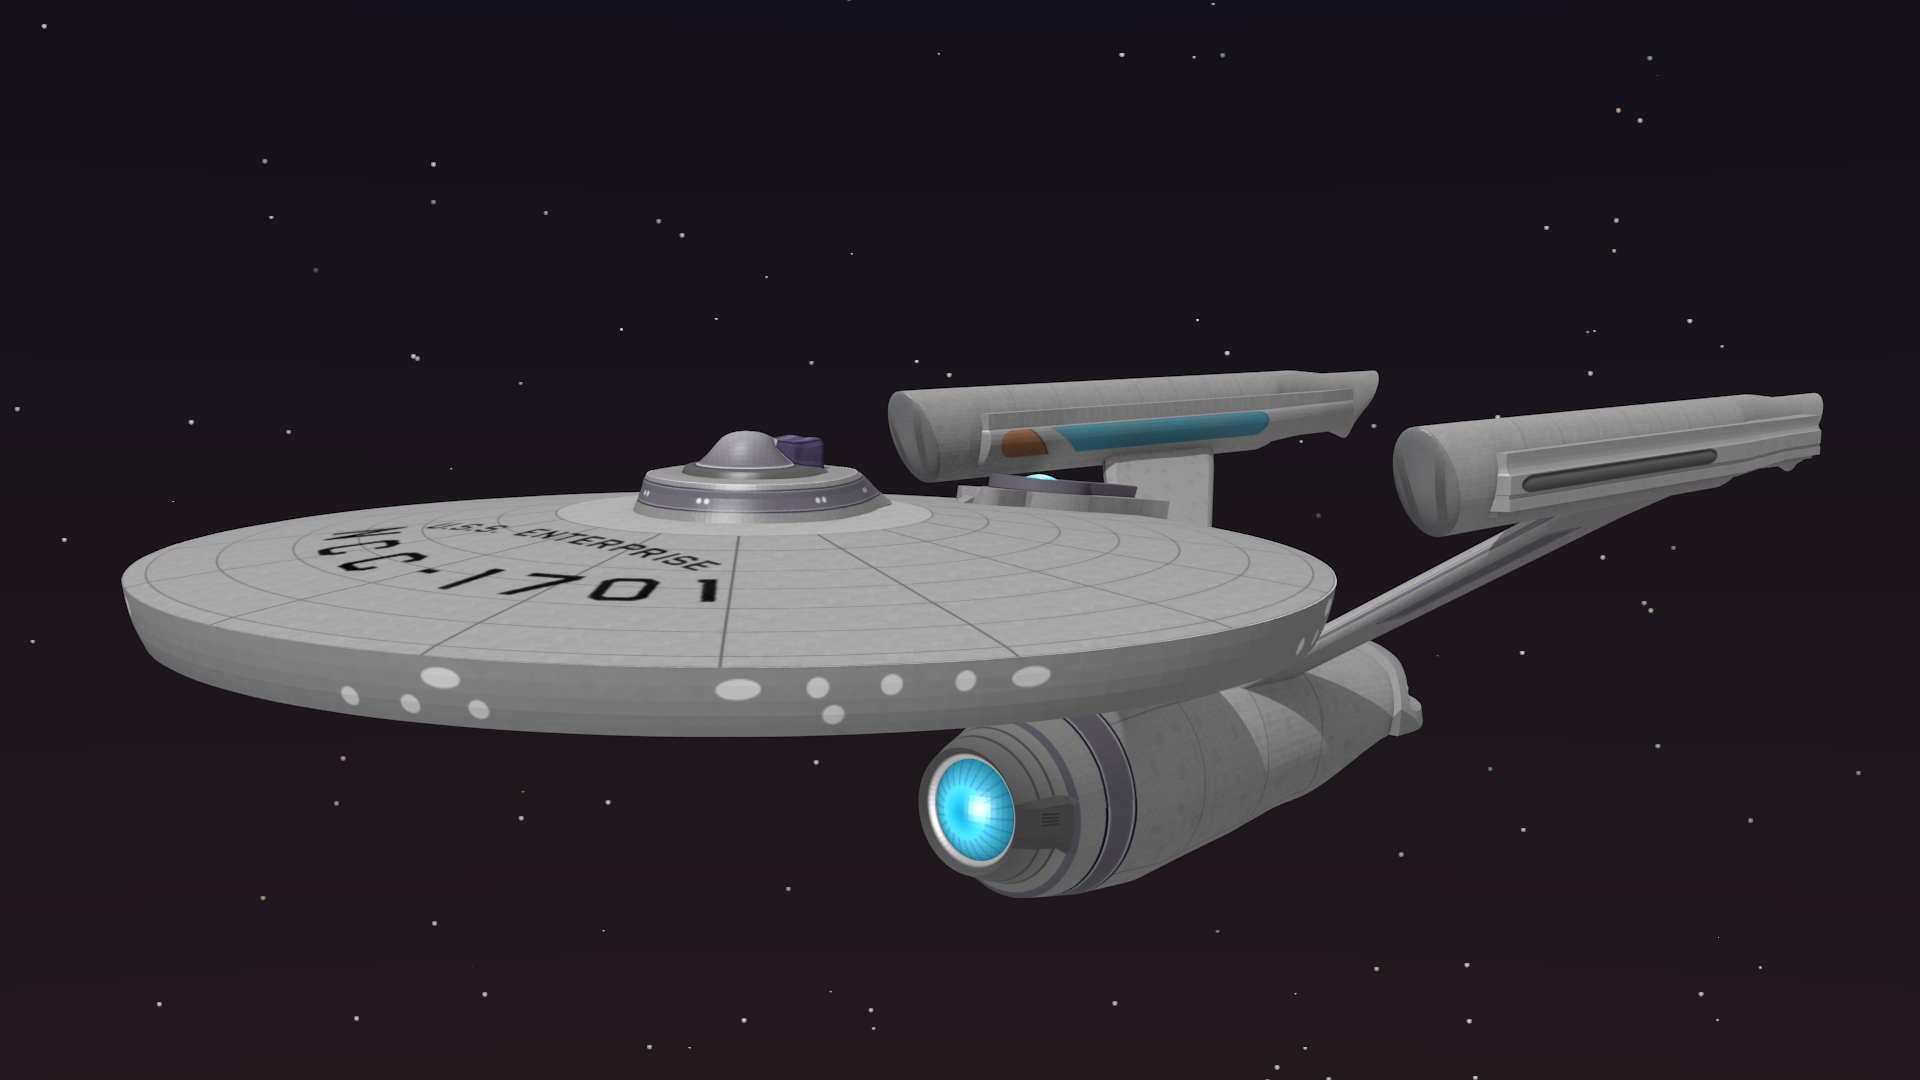 USS Enterprise NCC 1701 - 1 by petrnohejl